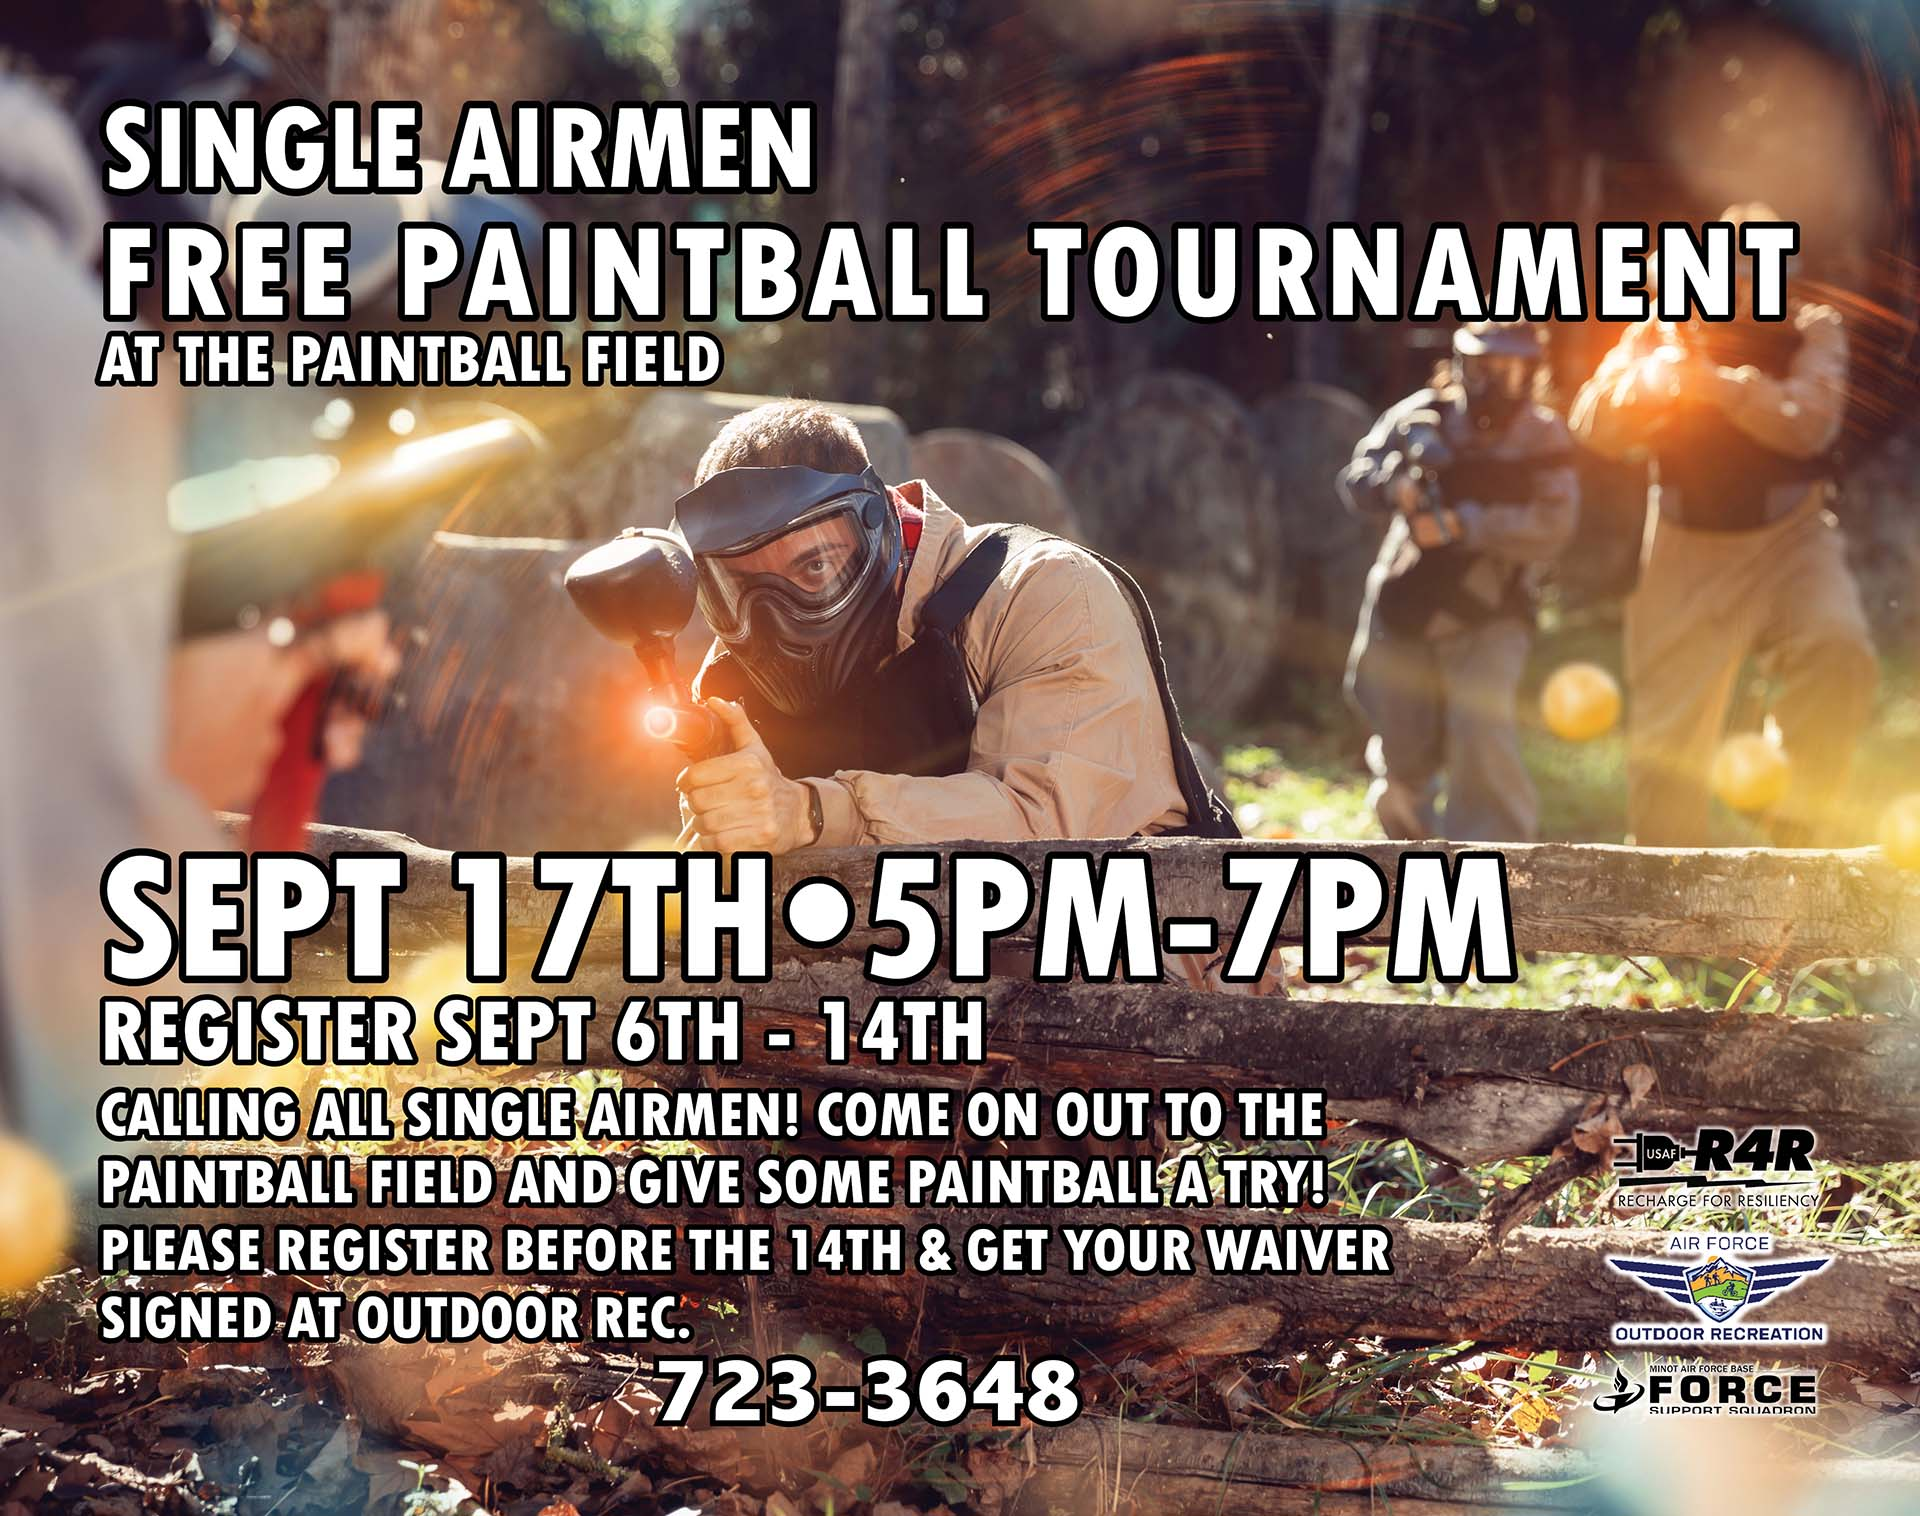 Single Airman Free Paintball Tournament